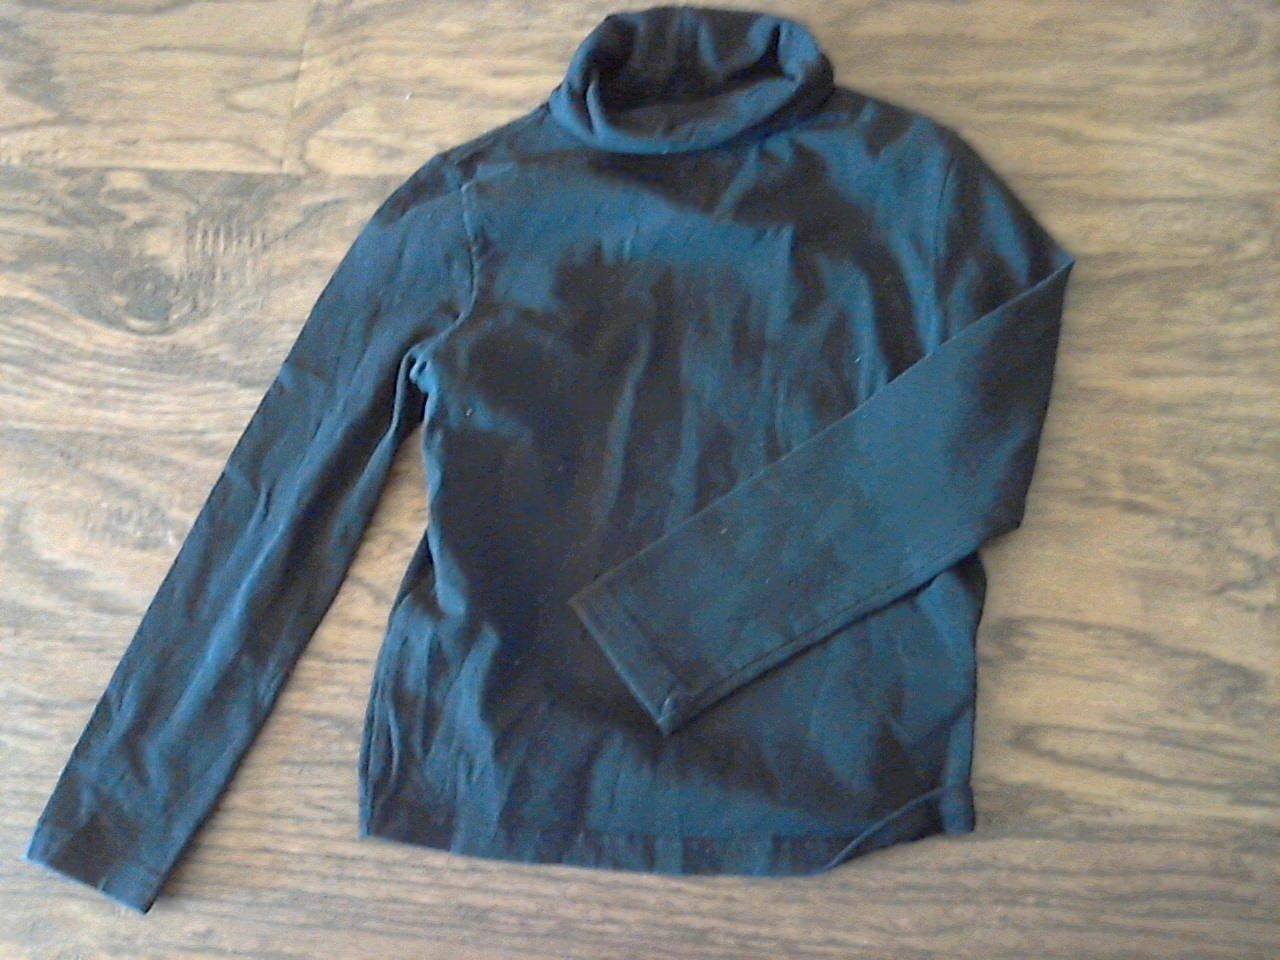 George girl's black turtleneck long sleeve shirt s/ch (6/6x